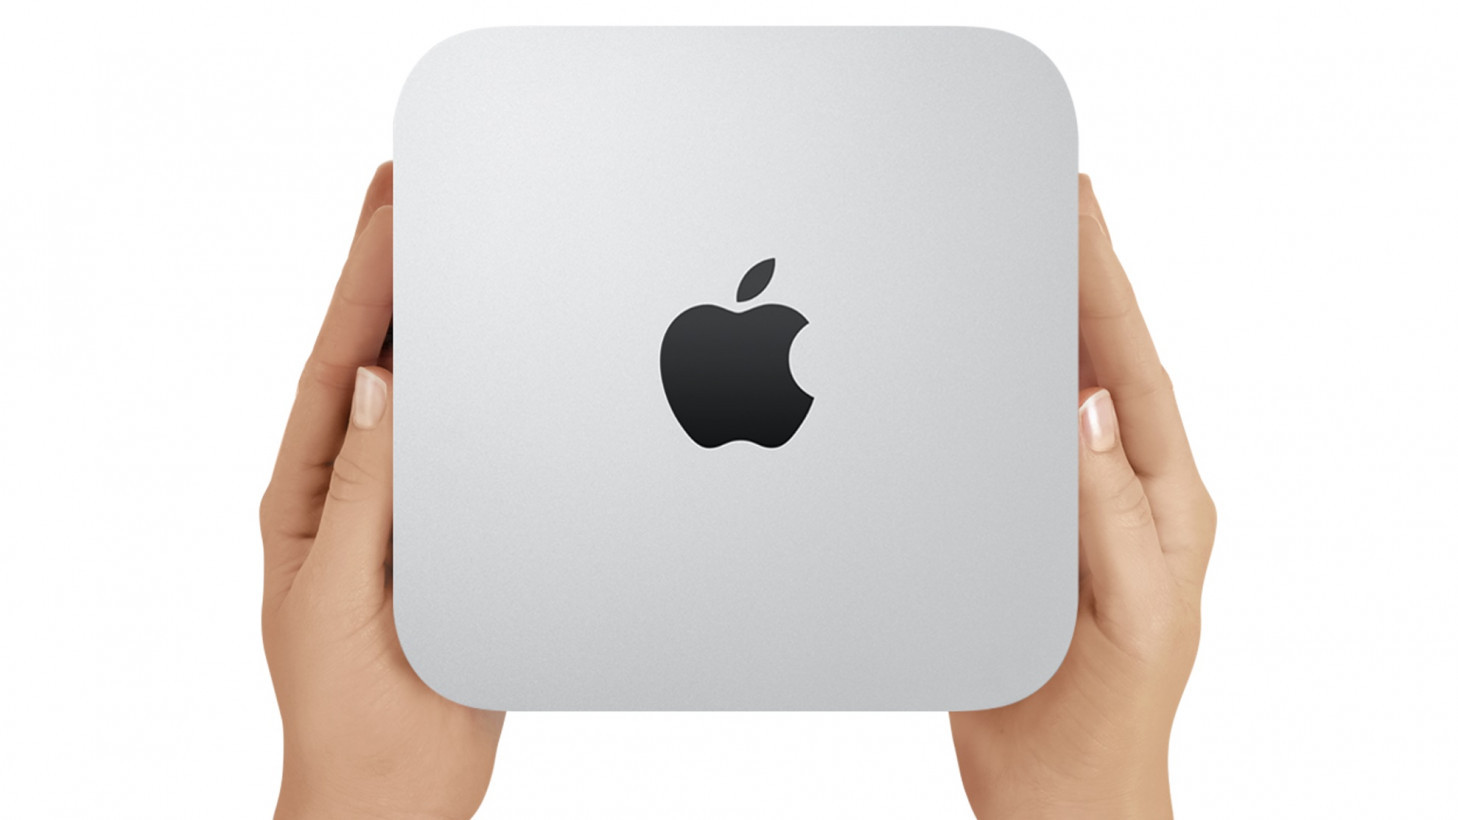 MacBook Air 终于要更新了,或许还有 性能爆棚 的 Mac mini